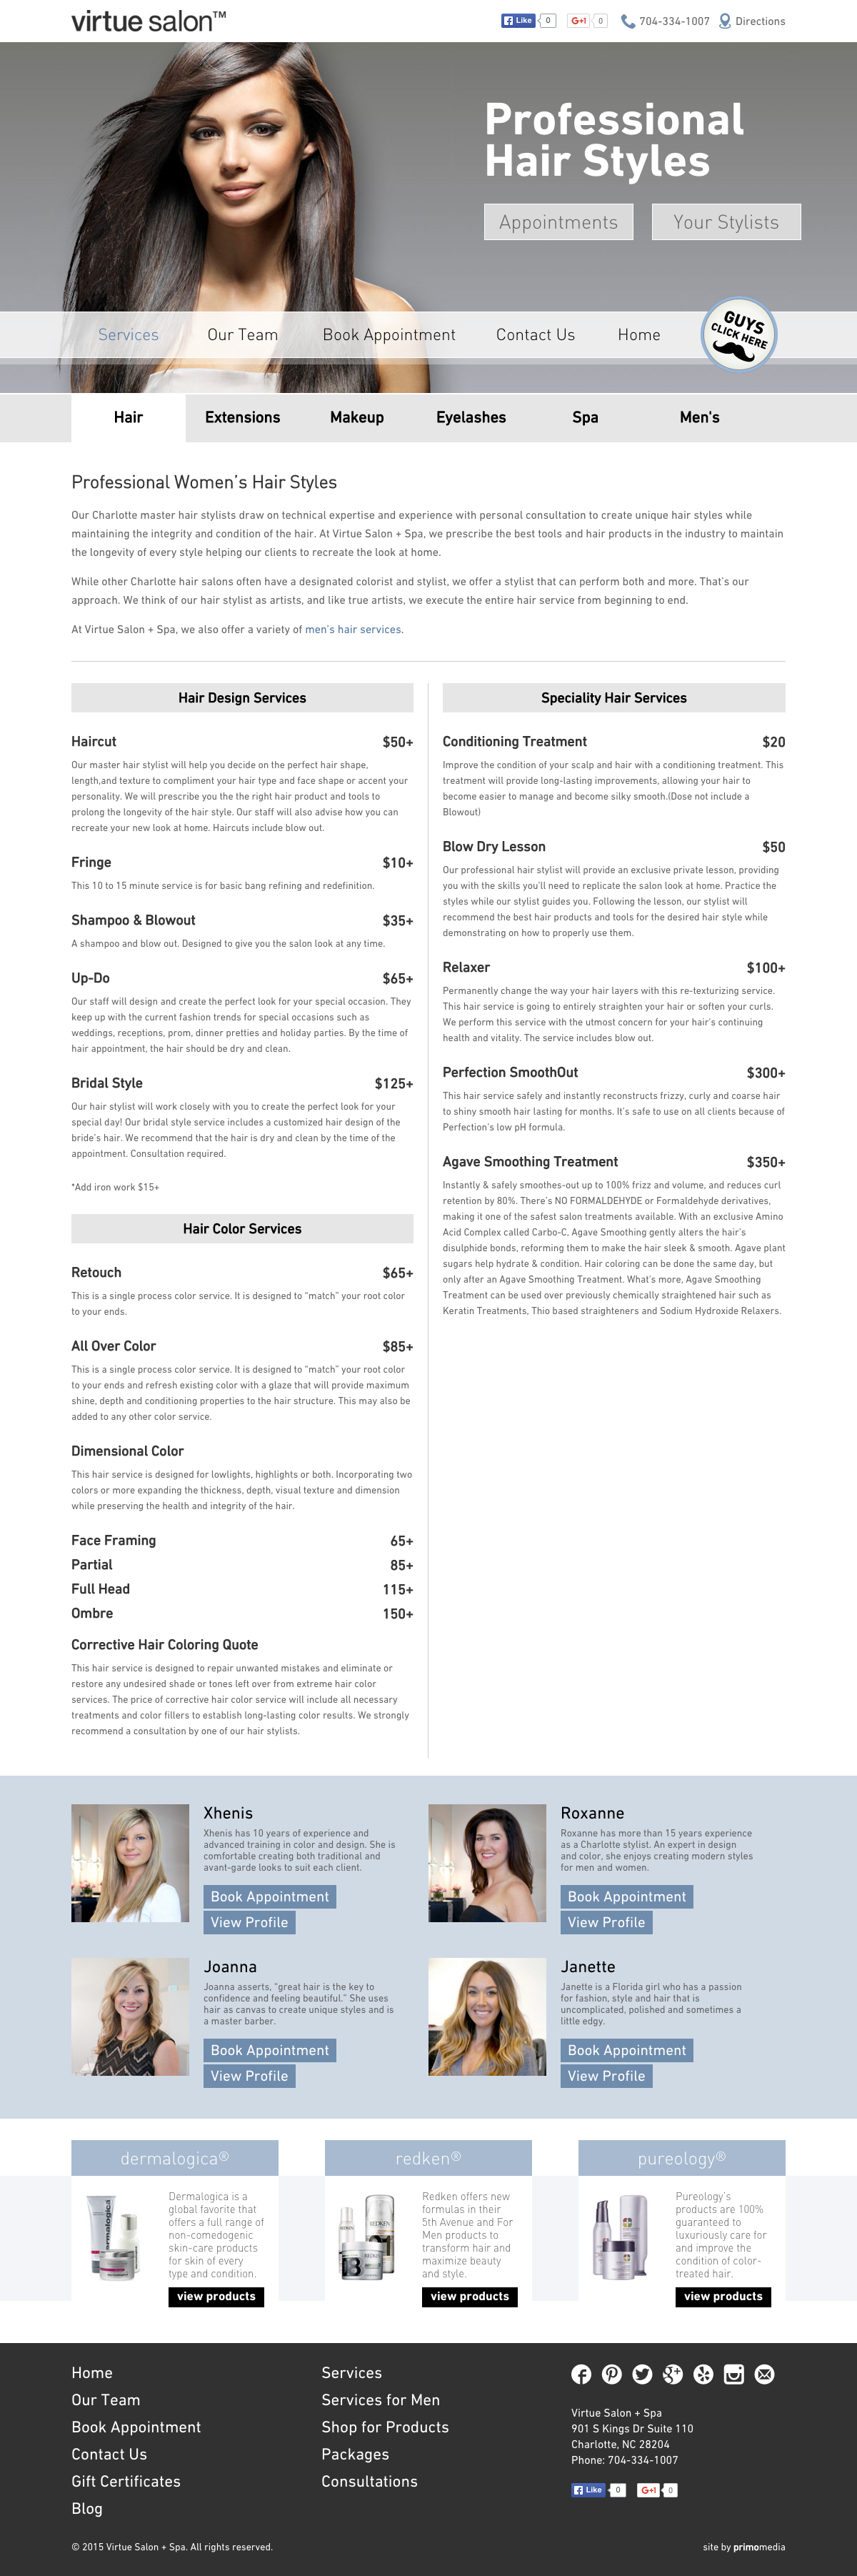 Virtue Salon wordpress Responsive